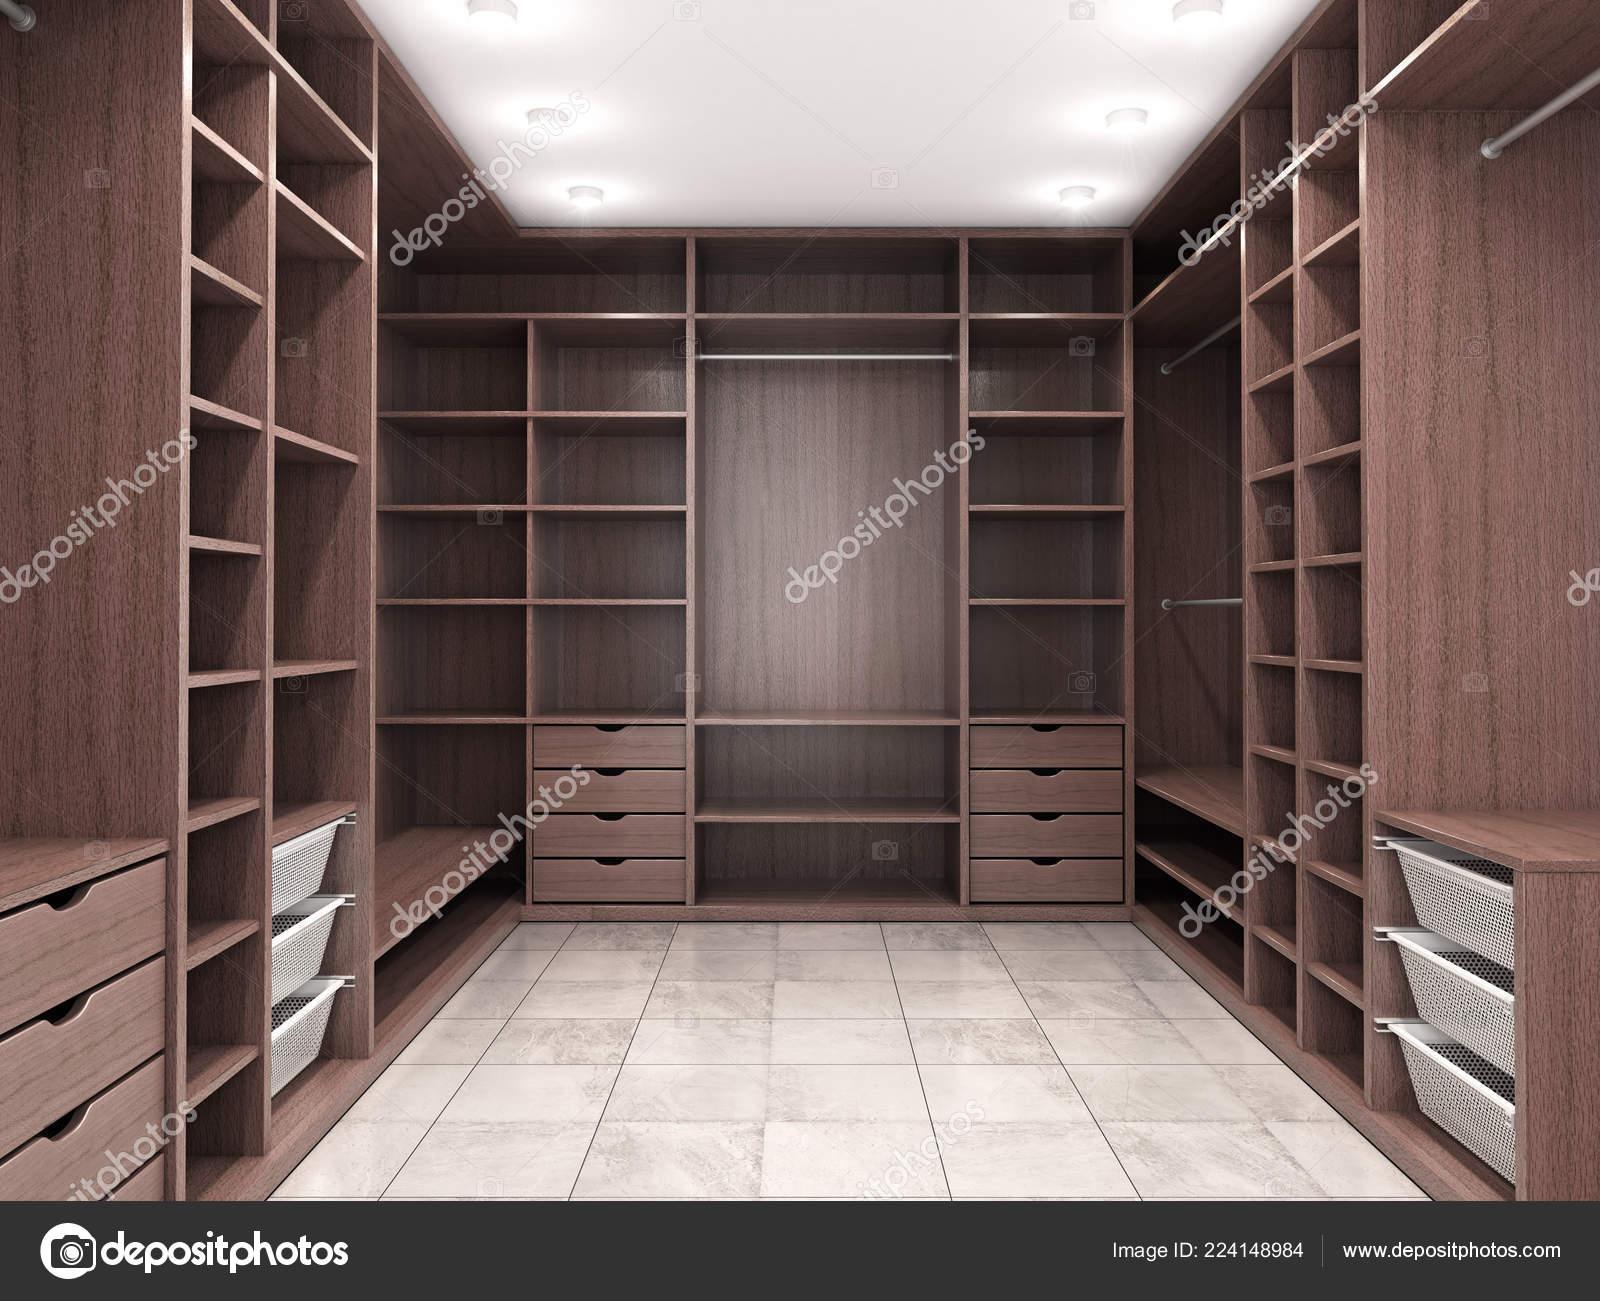 Moderne luxus dressing room garderobe visualisierung u stockfoto